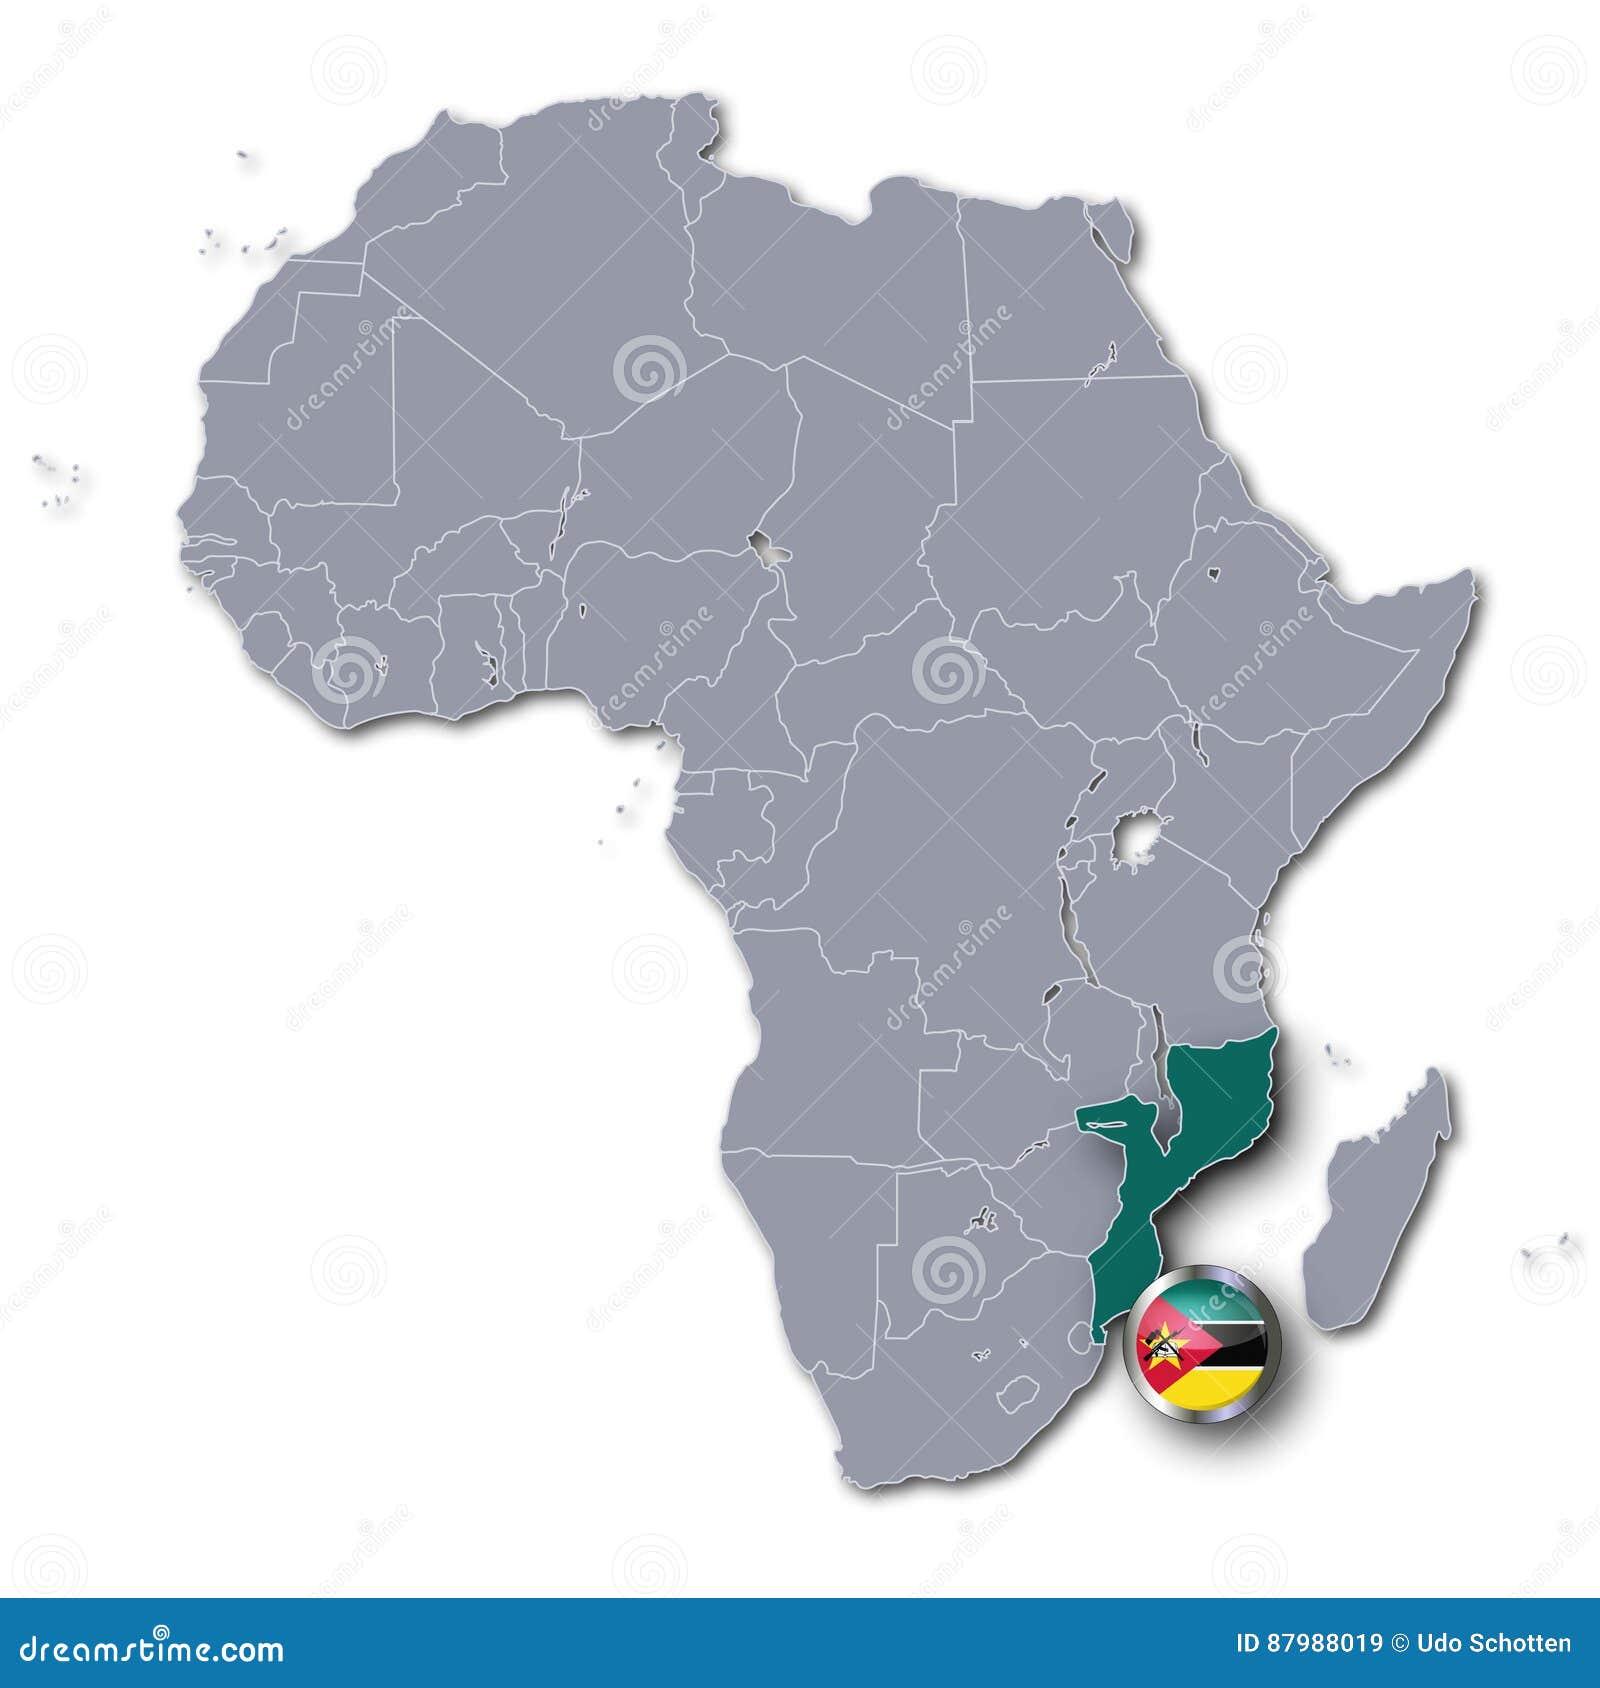 Mosambik Karte.Afrika Karte Mit Mosambik Stock Abbildung Illustration Von Ikone